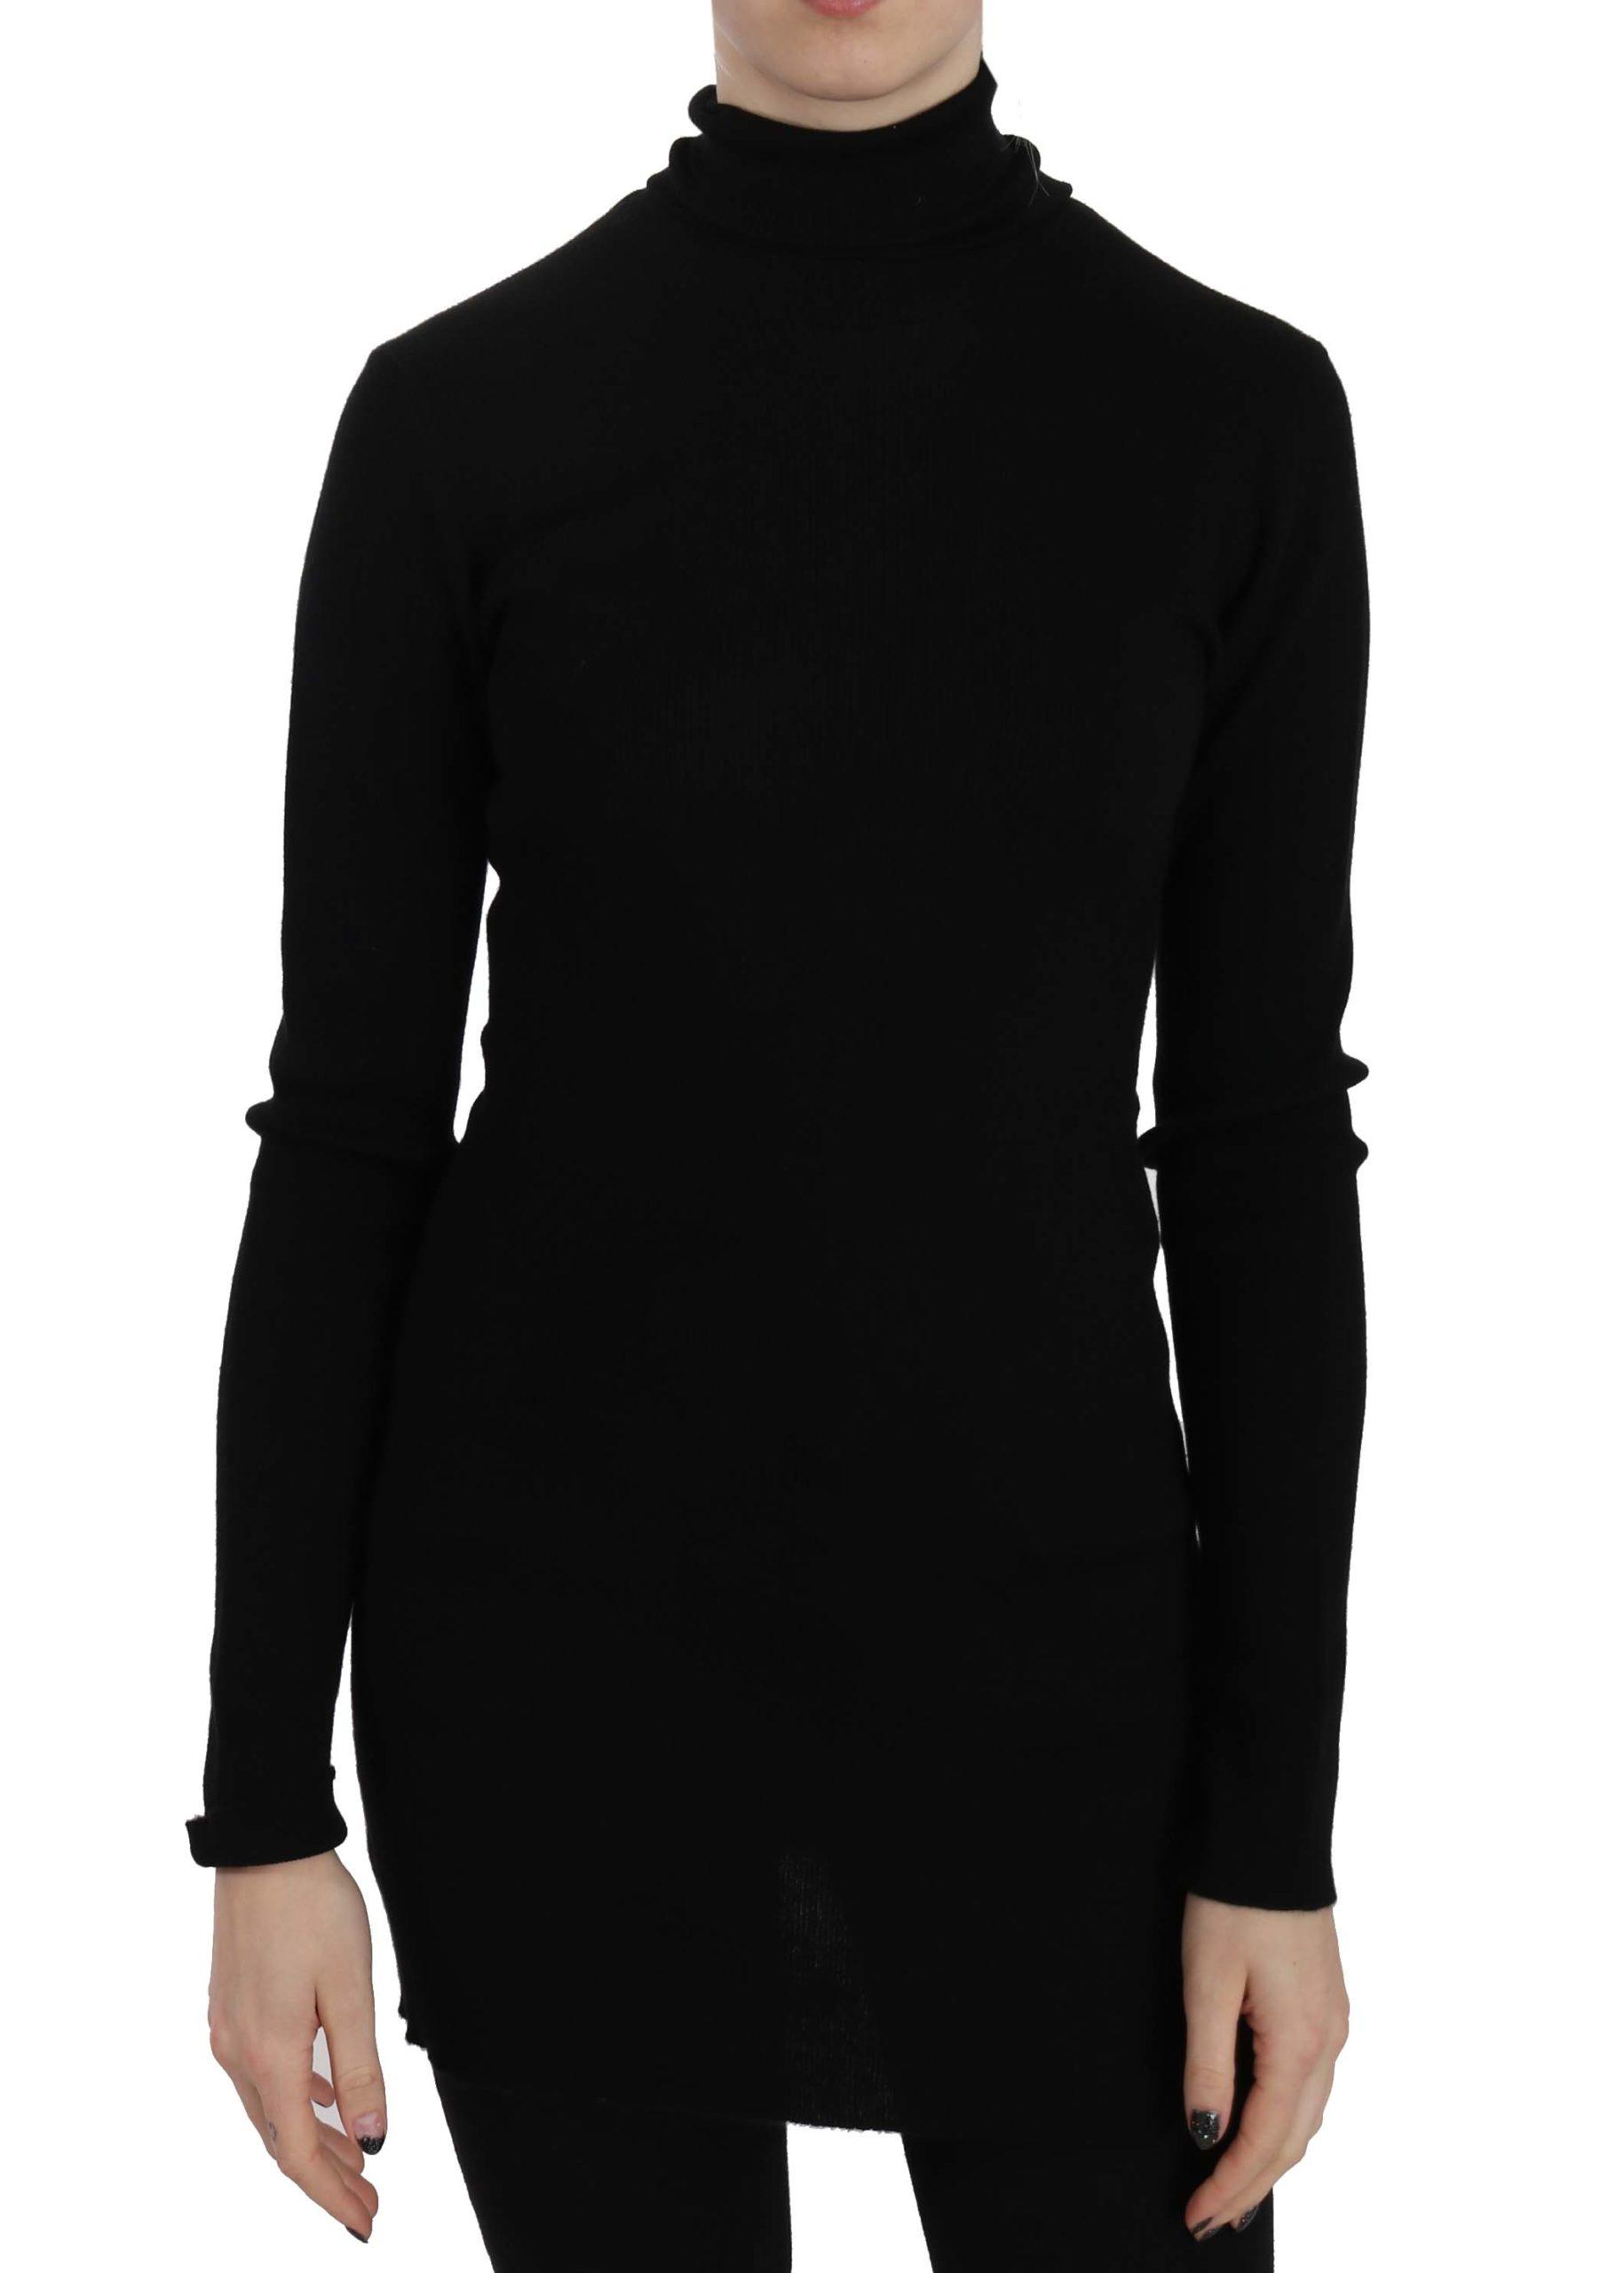 Dolce & Gabbana Women's Turtleneck Cashmere Pullover Sweater Black TSH3261 - IT38 XS